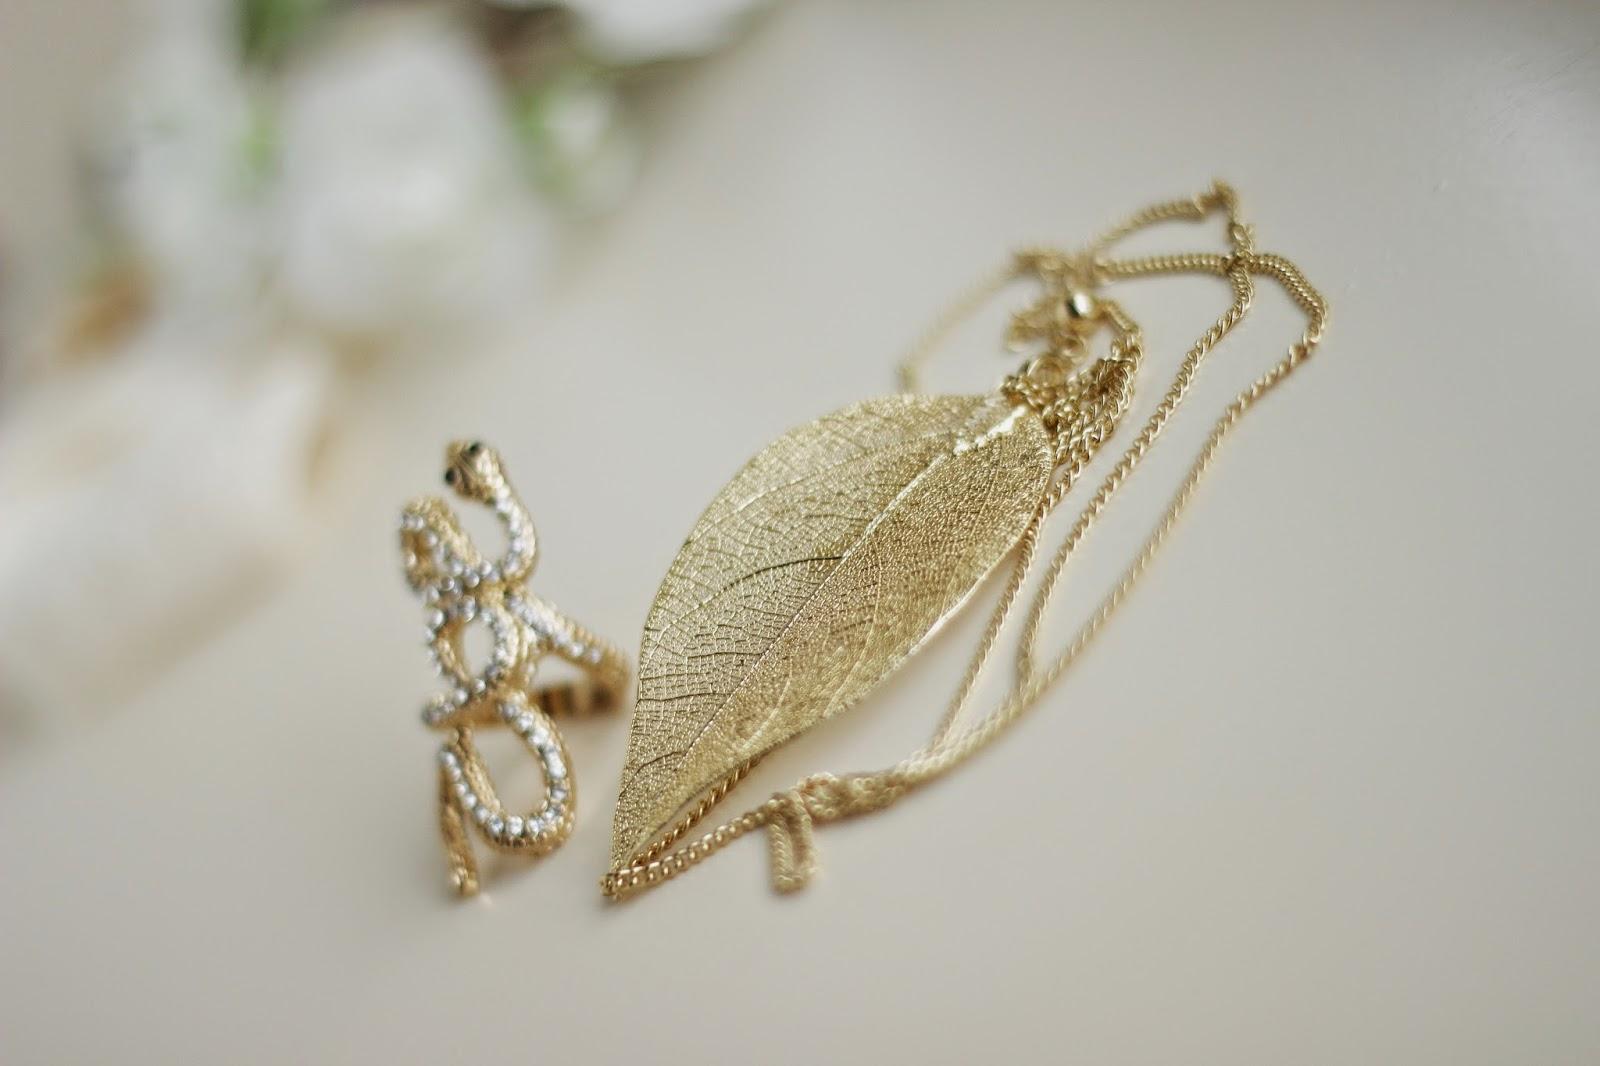 new in h&m jewelry